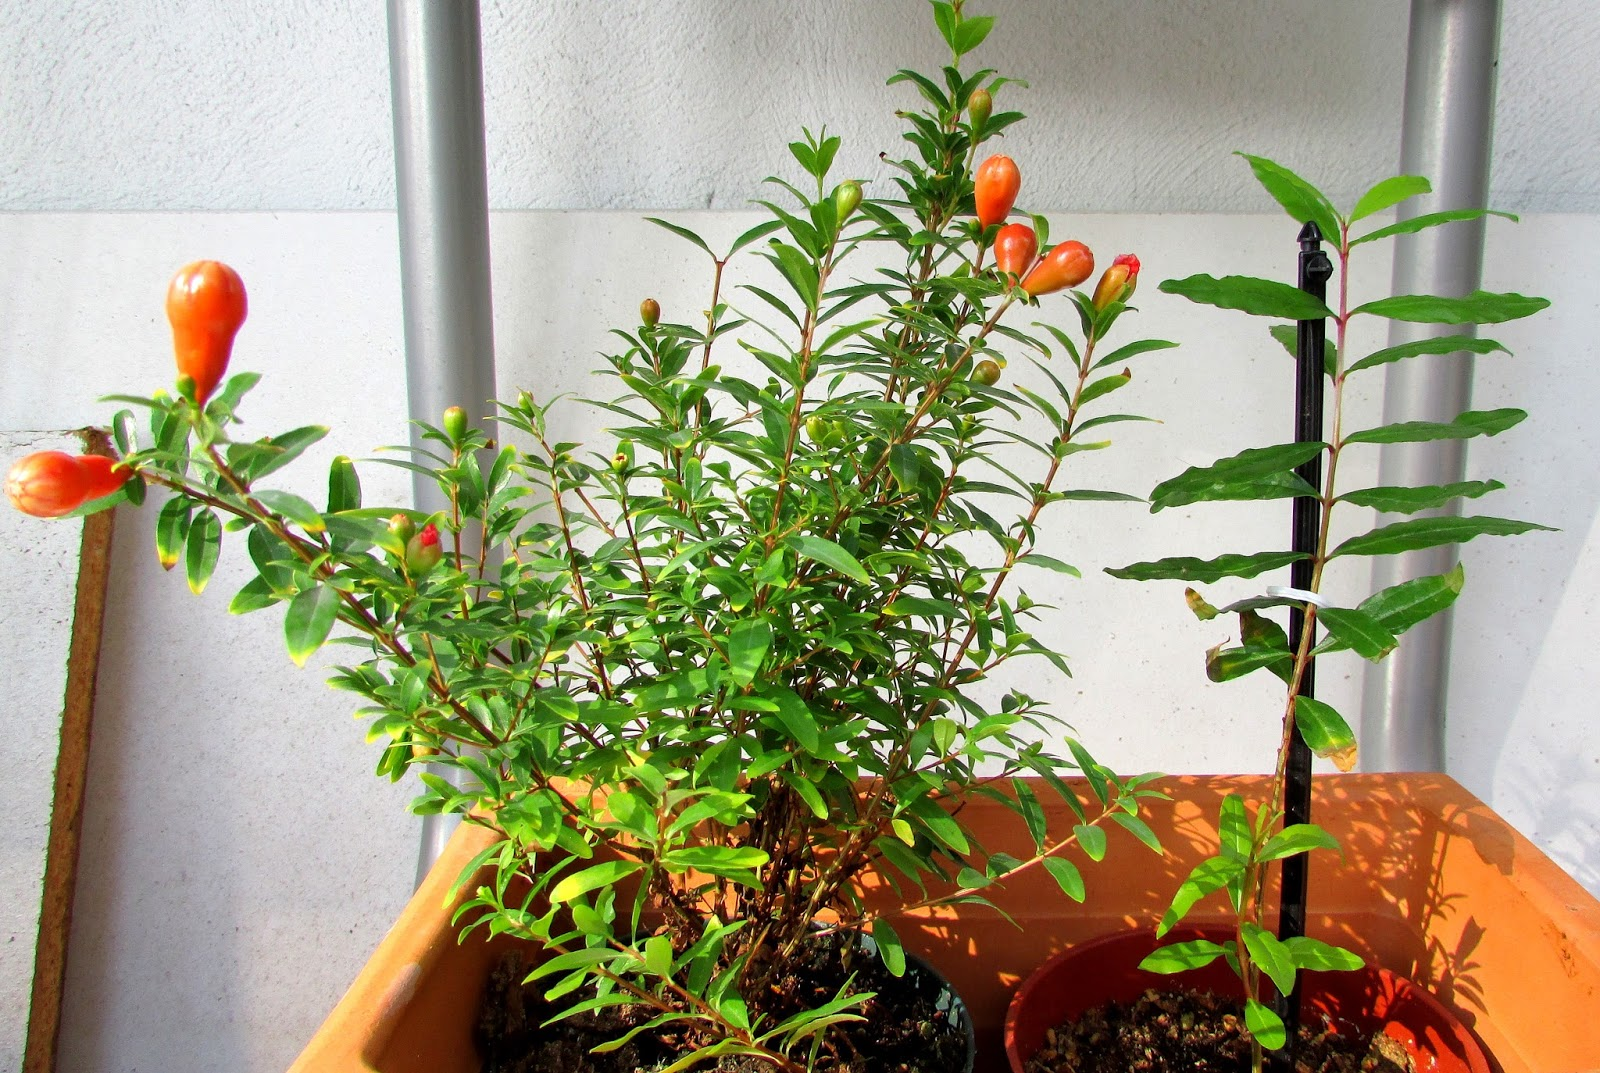 punica granatum nana my gardening. Black Bedroom Furniture Sets. Home Design Ideas